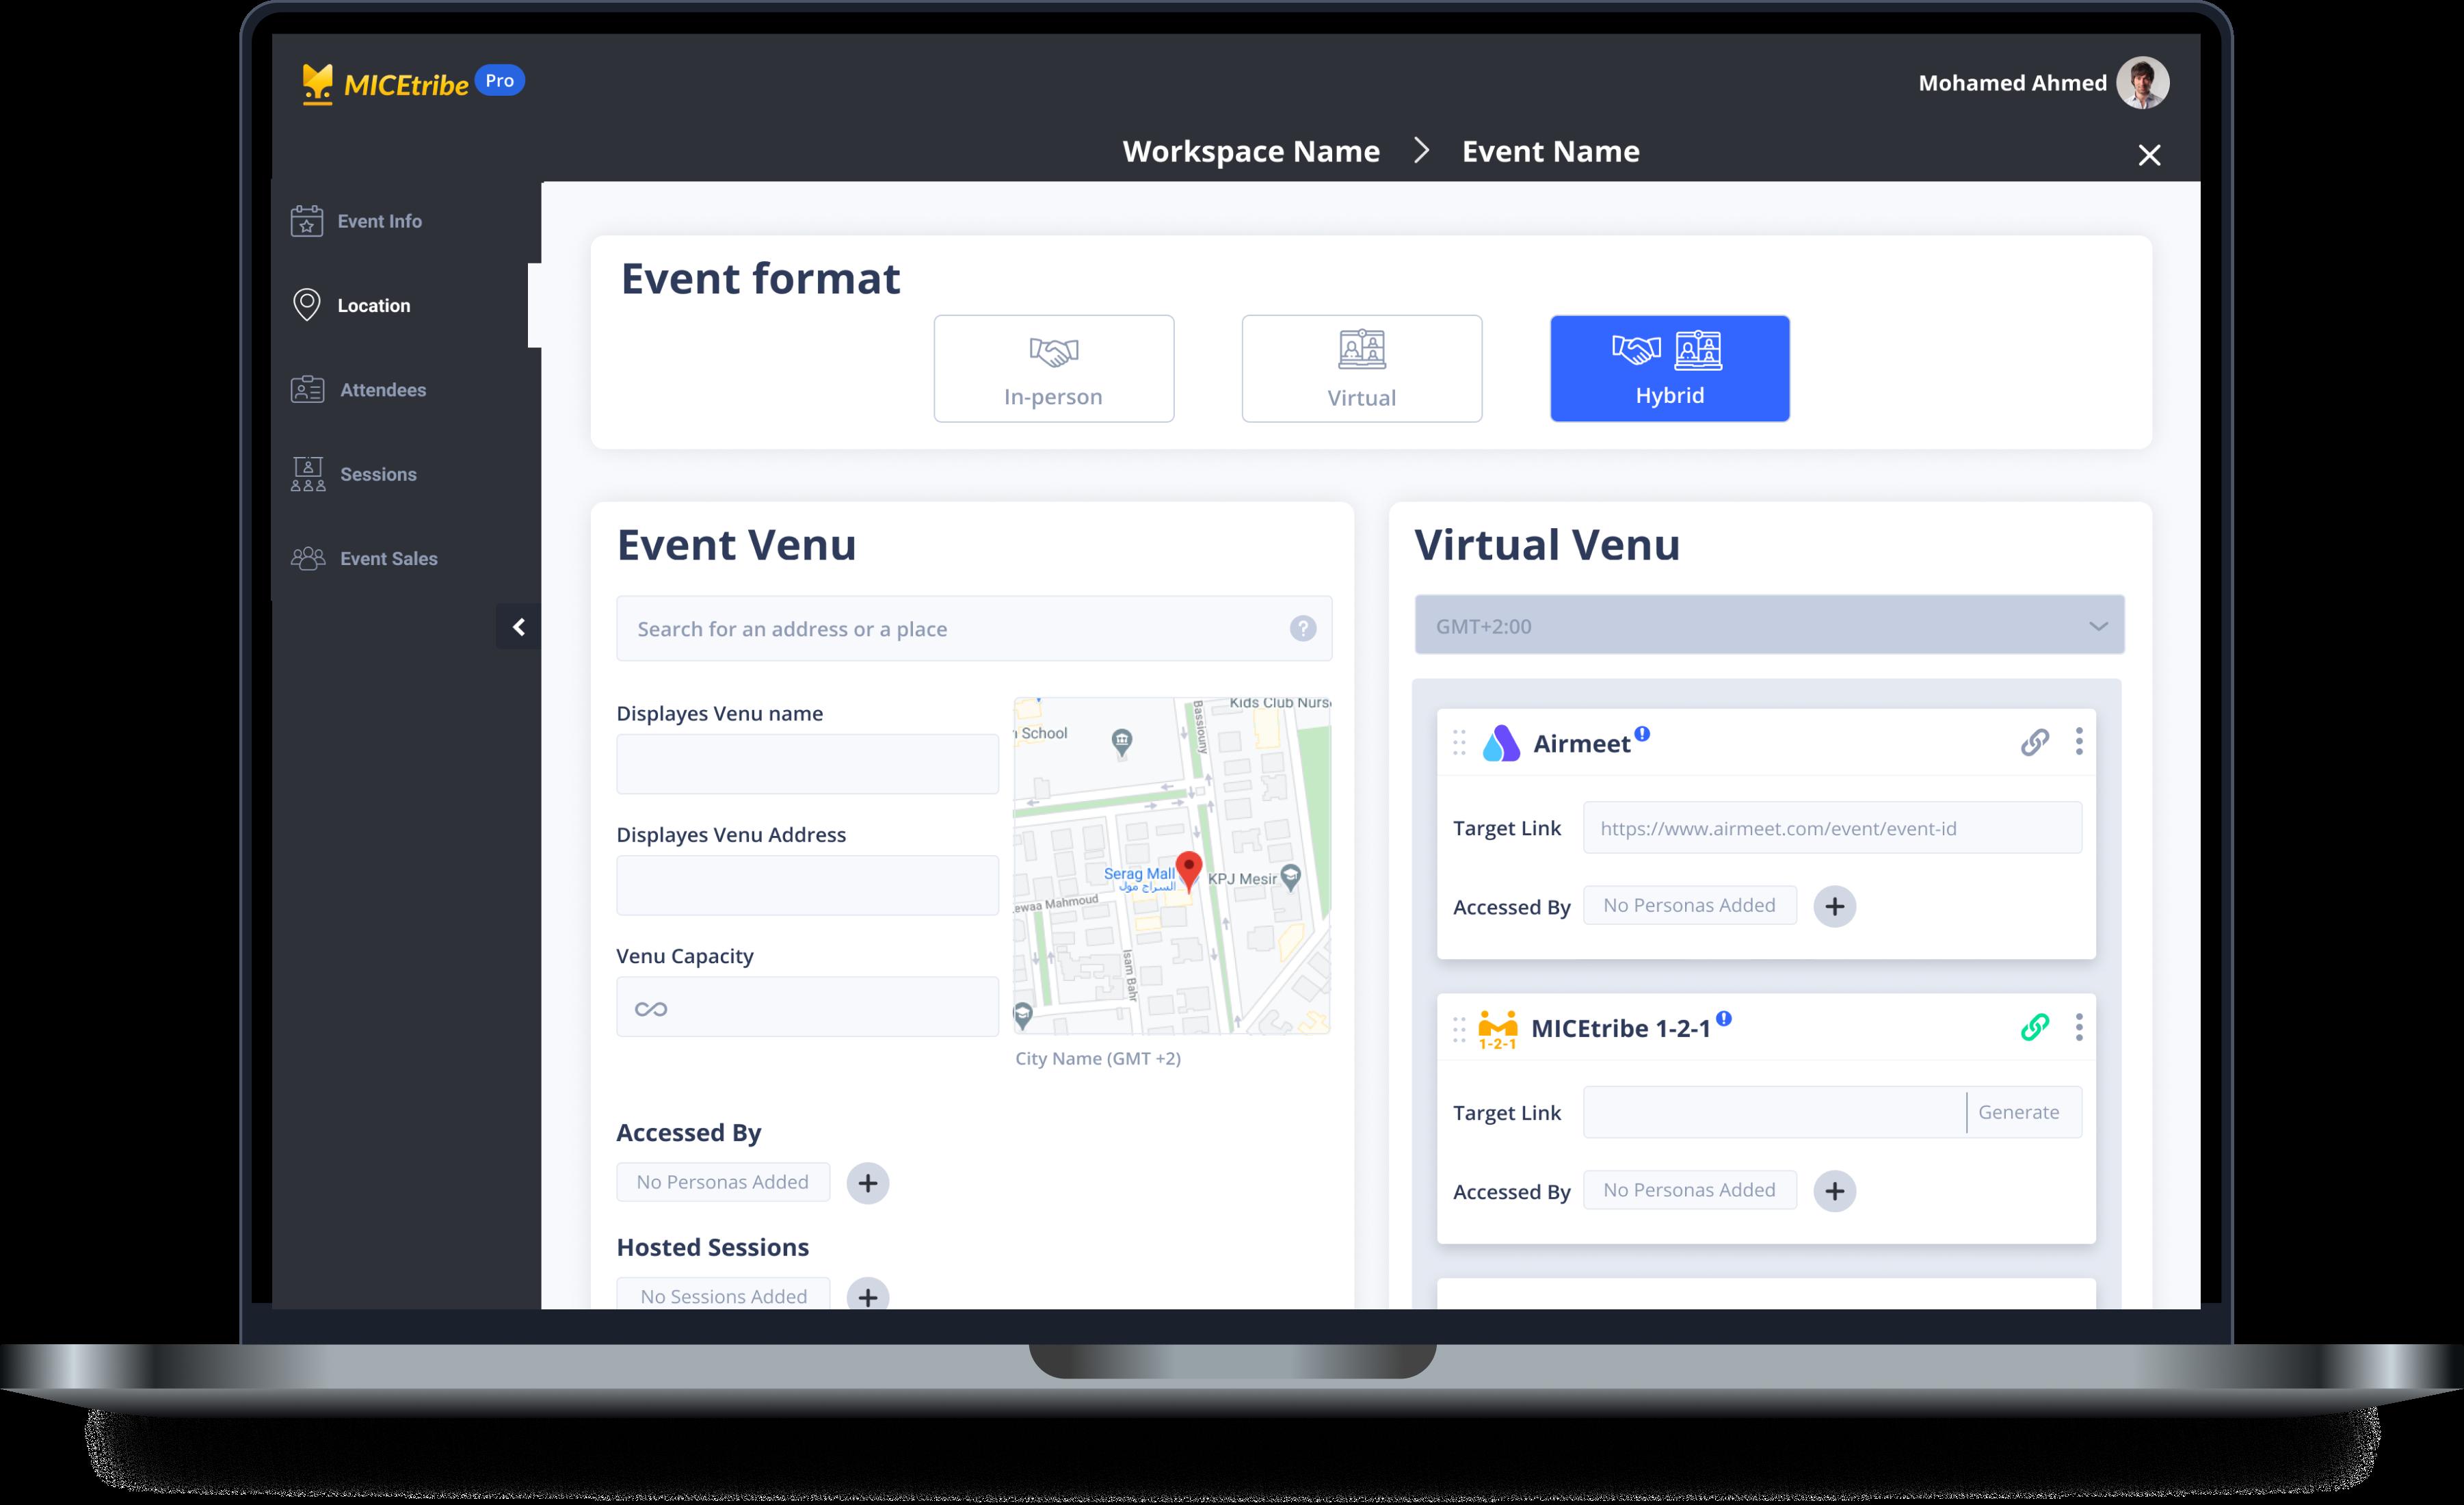 Hybrid event selection